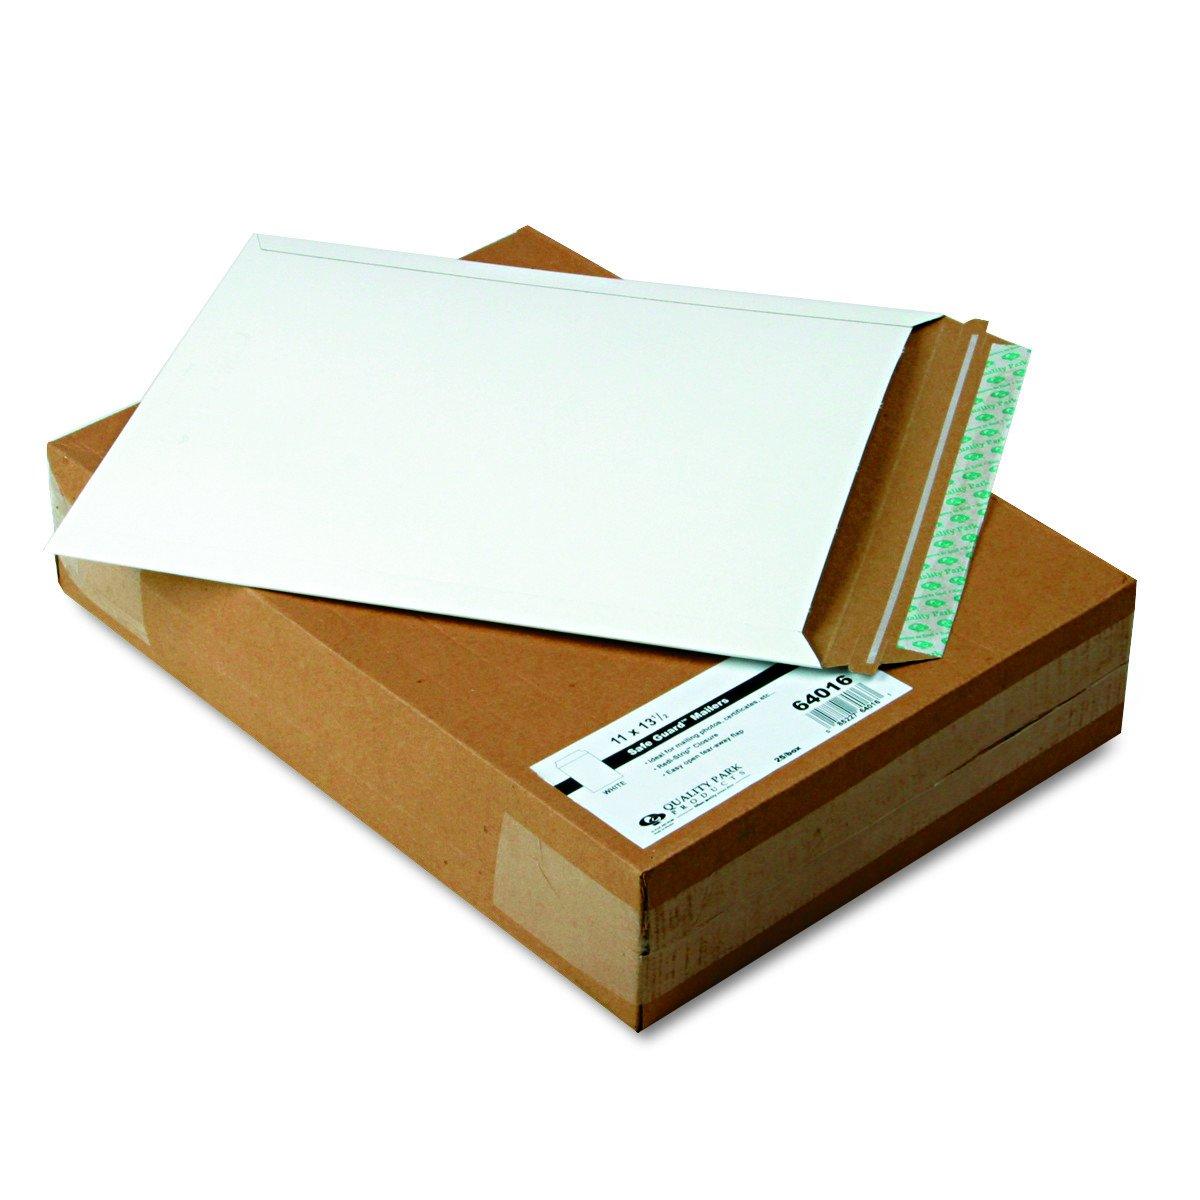 Qualité Park 64016Qualité Park Extra-rigid Fibres Photo/Document enveloppes, 11x 13–1/2, 25/Box